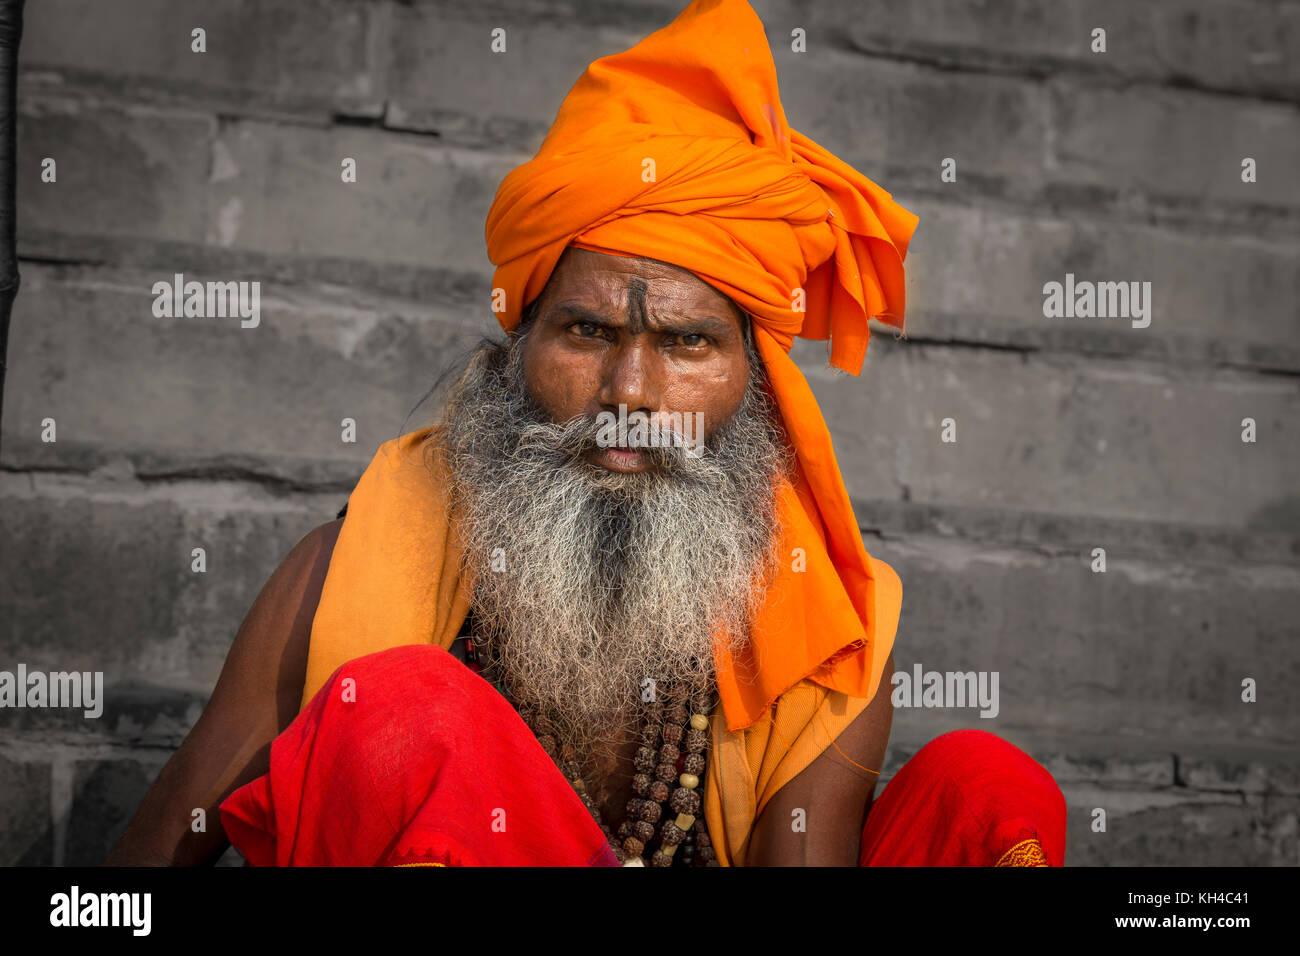 Varanasi sadhu man in close up portrait view - Stock Image